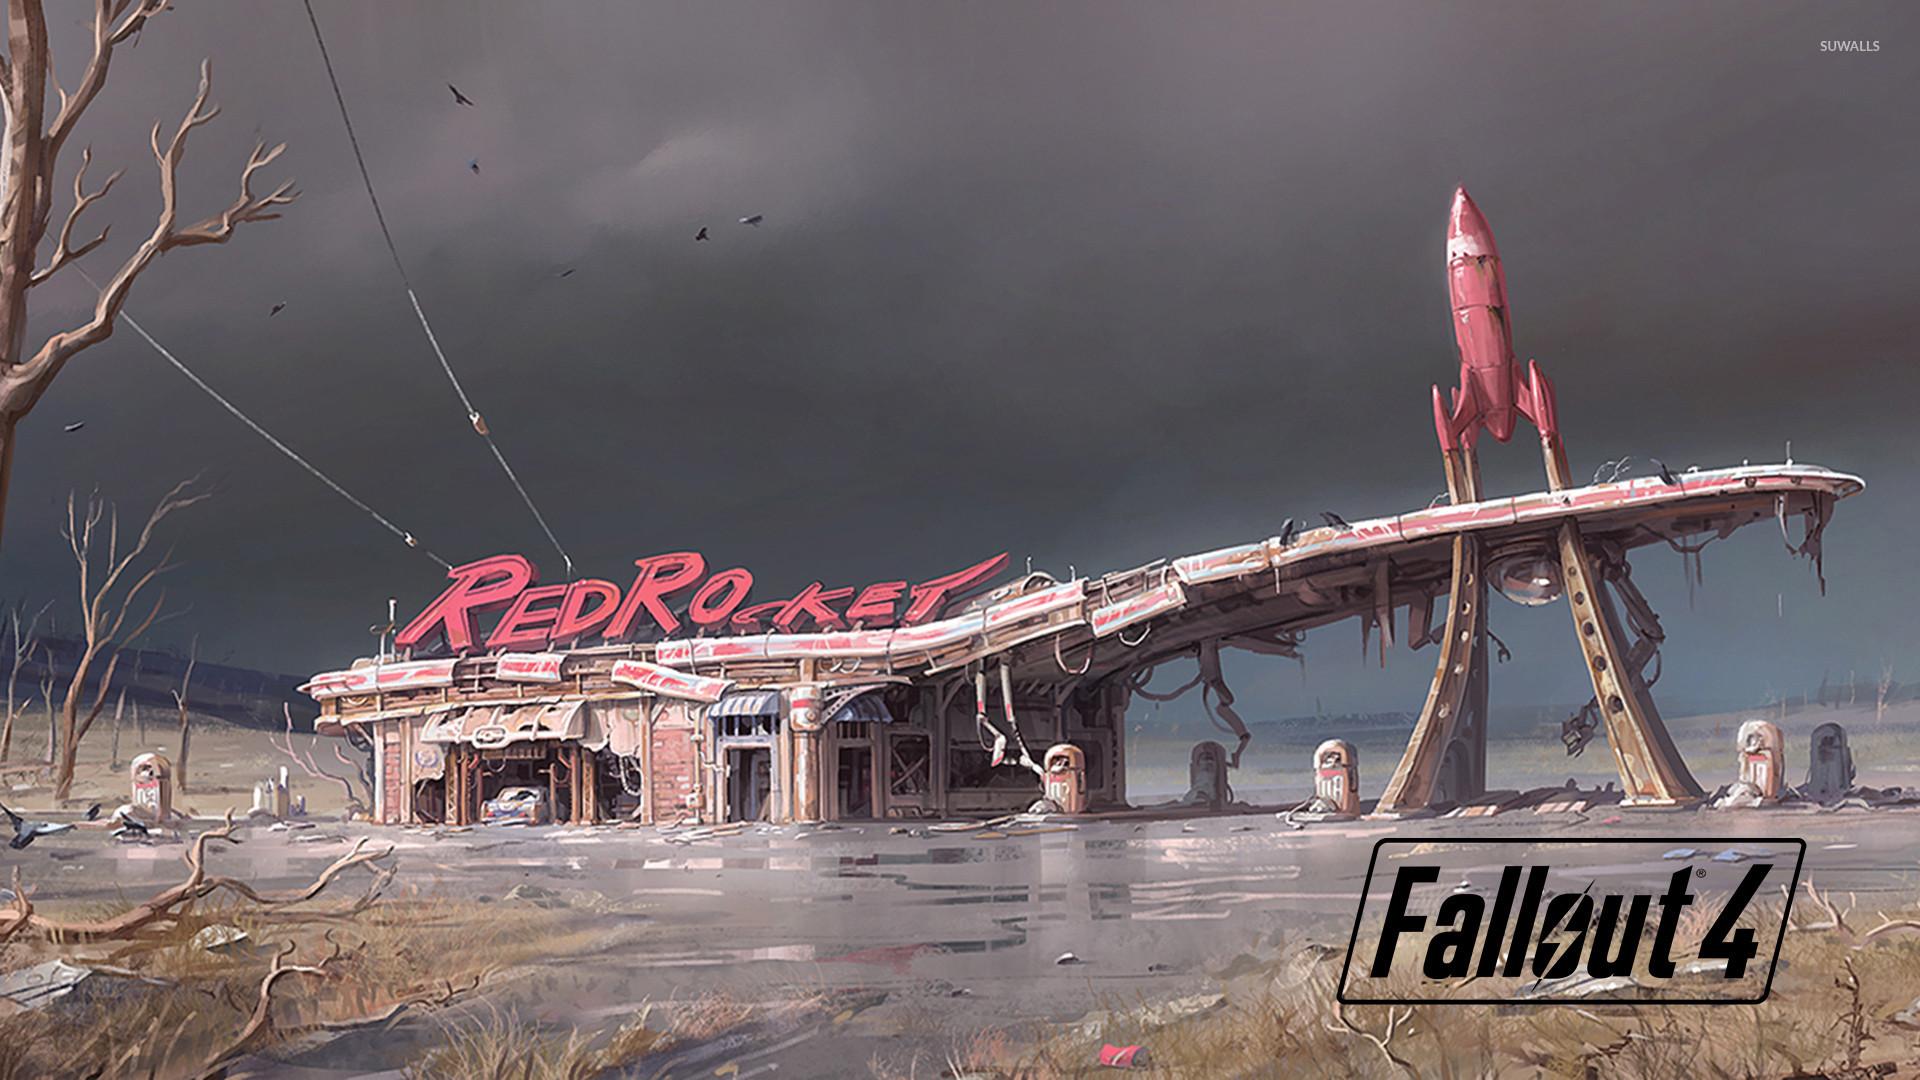 RedRocket in Fallout 4 wallpaper jpg